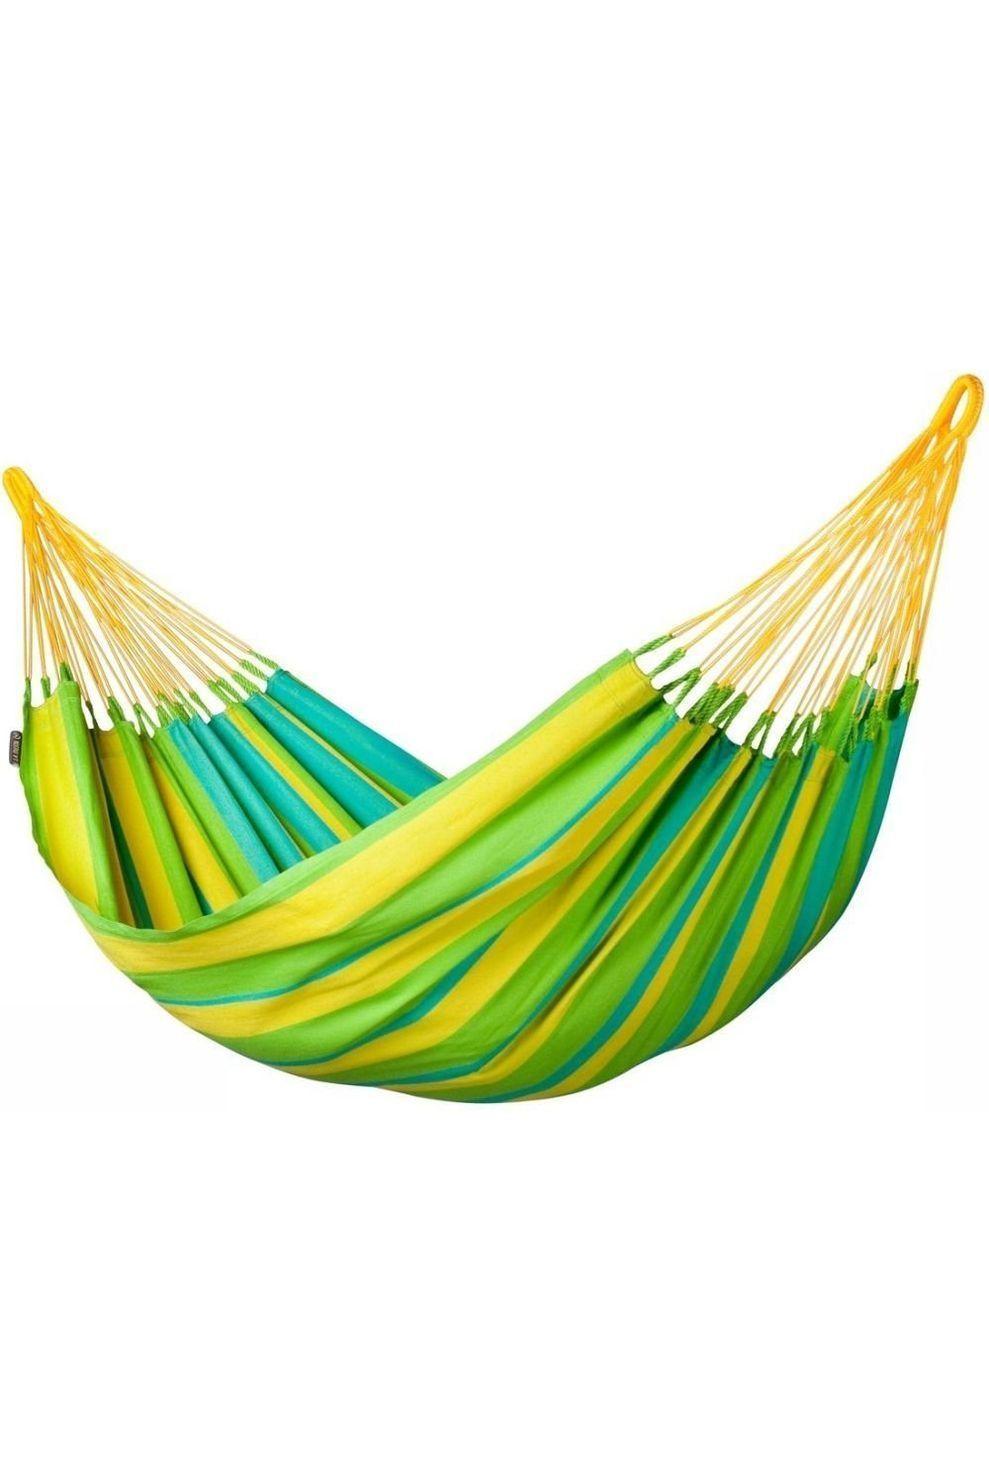 La Siesta Hangmat Sonrisa Single - Limoen Groen